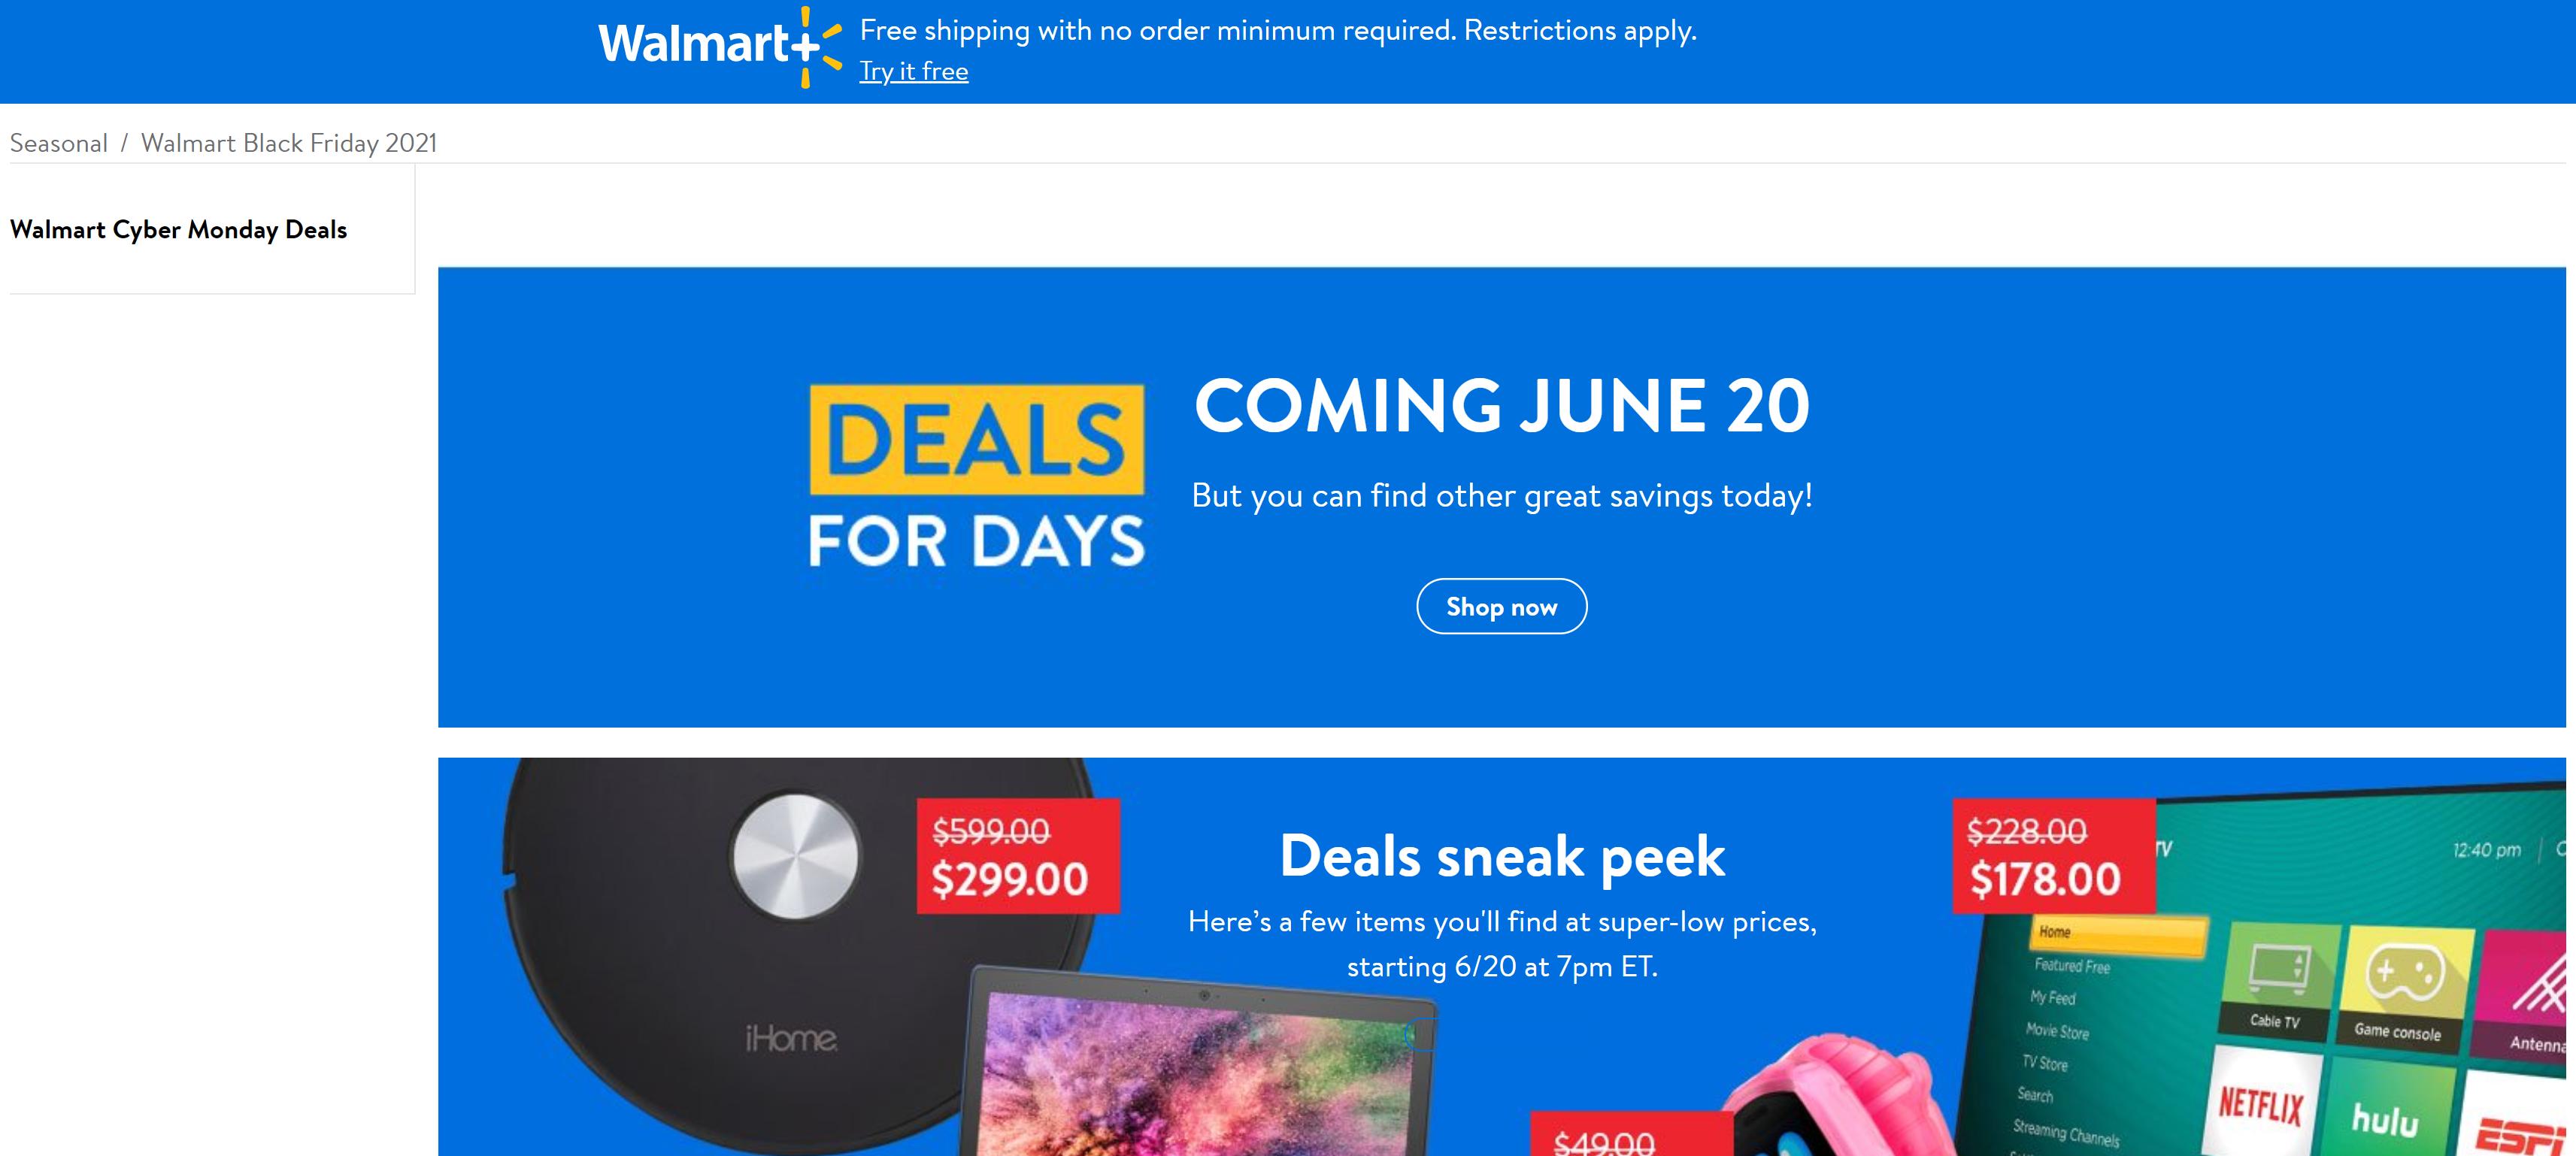 Walmart Deals for Days